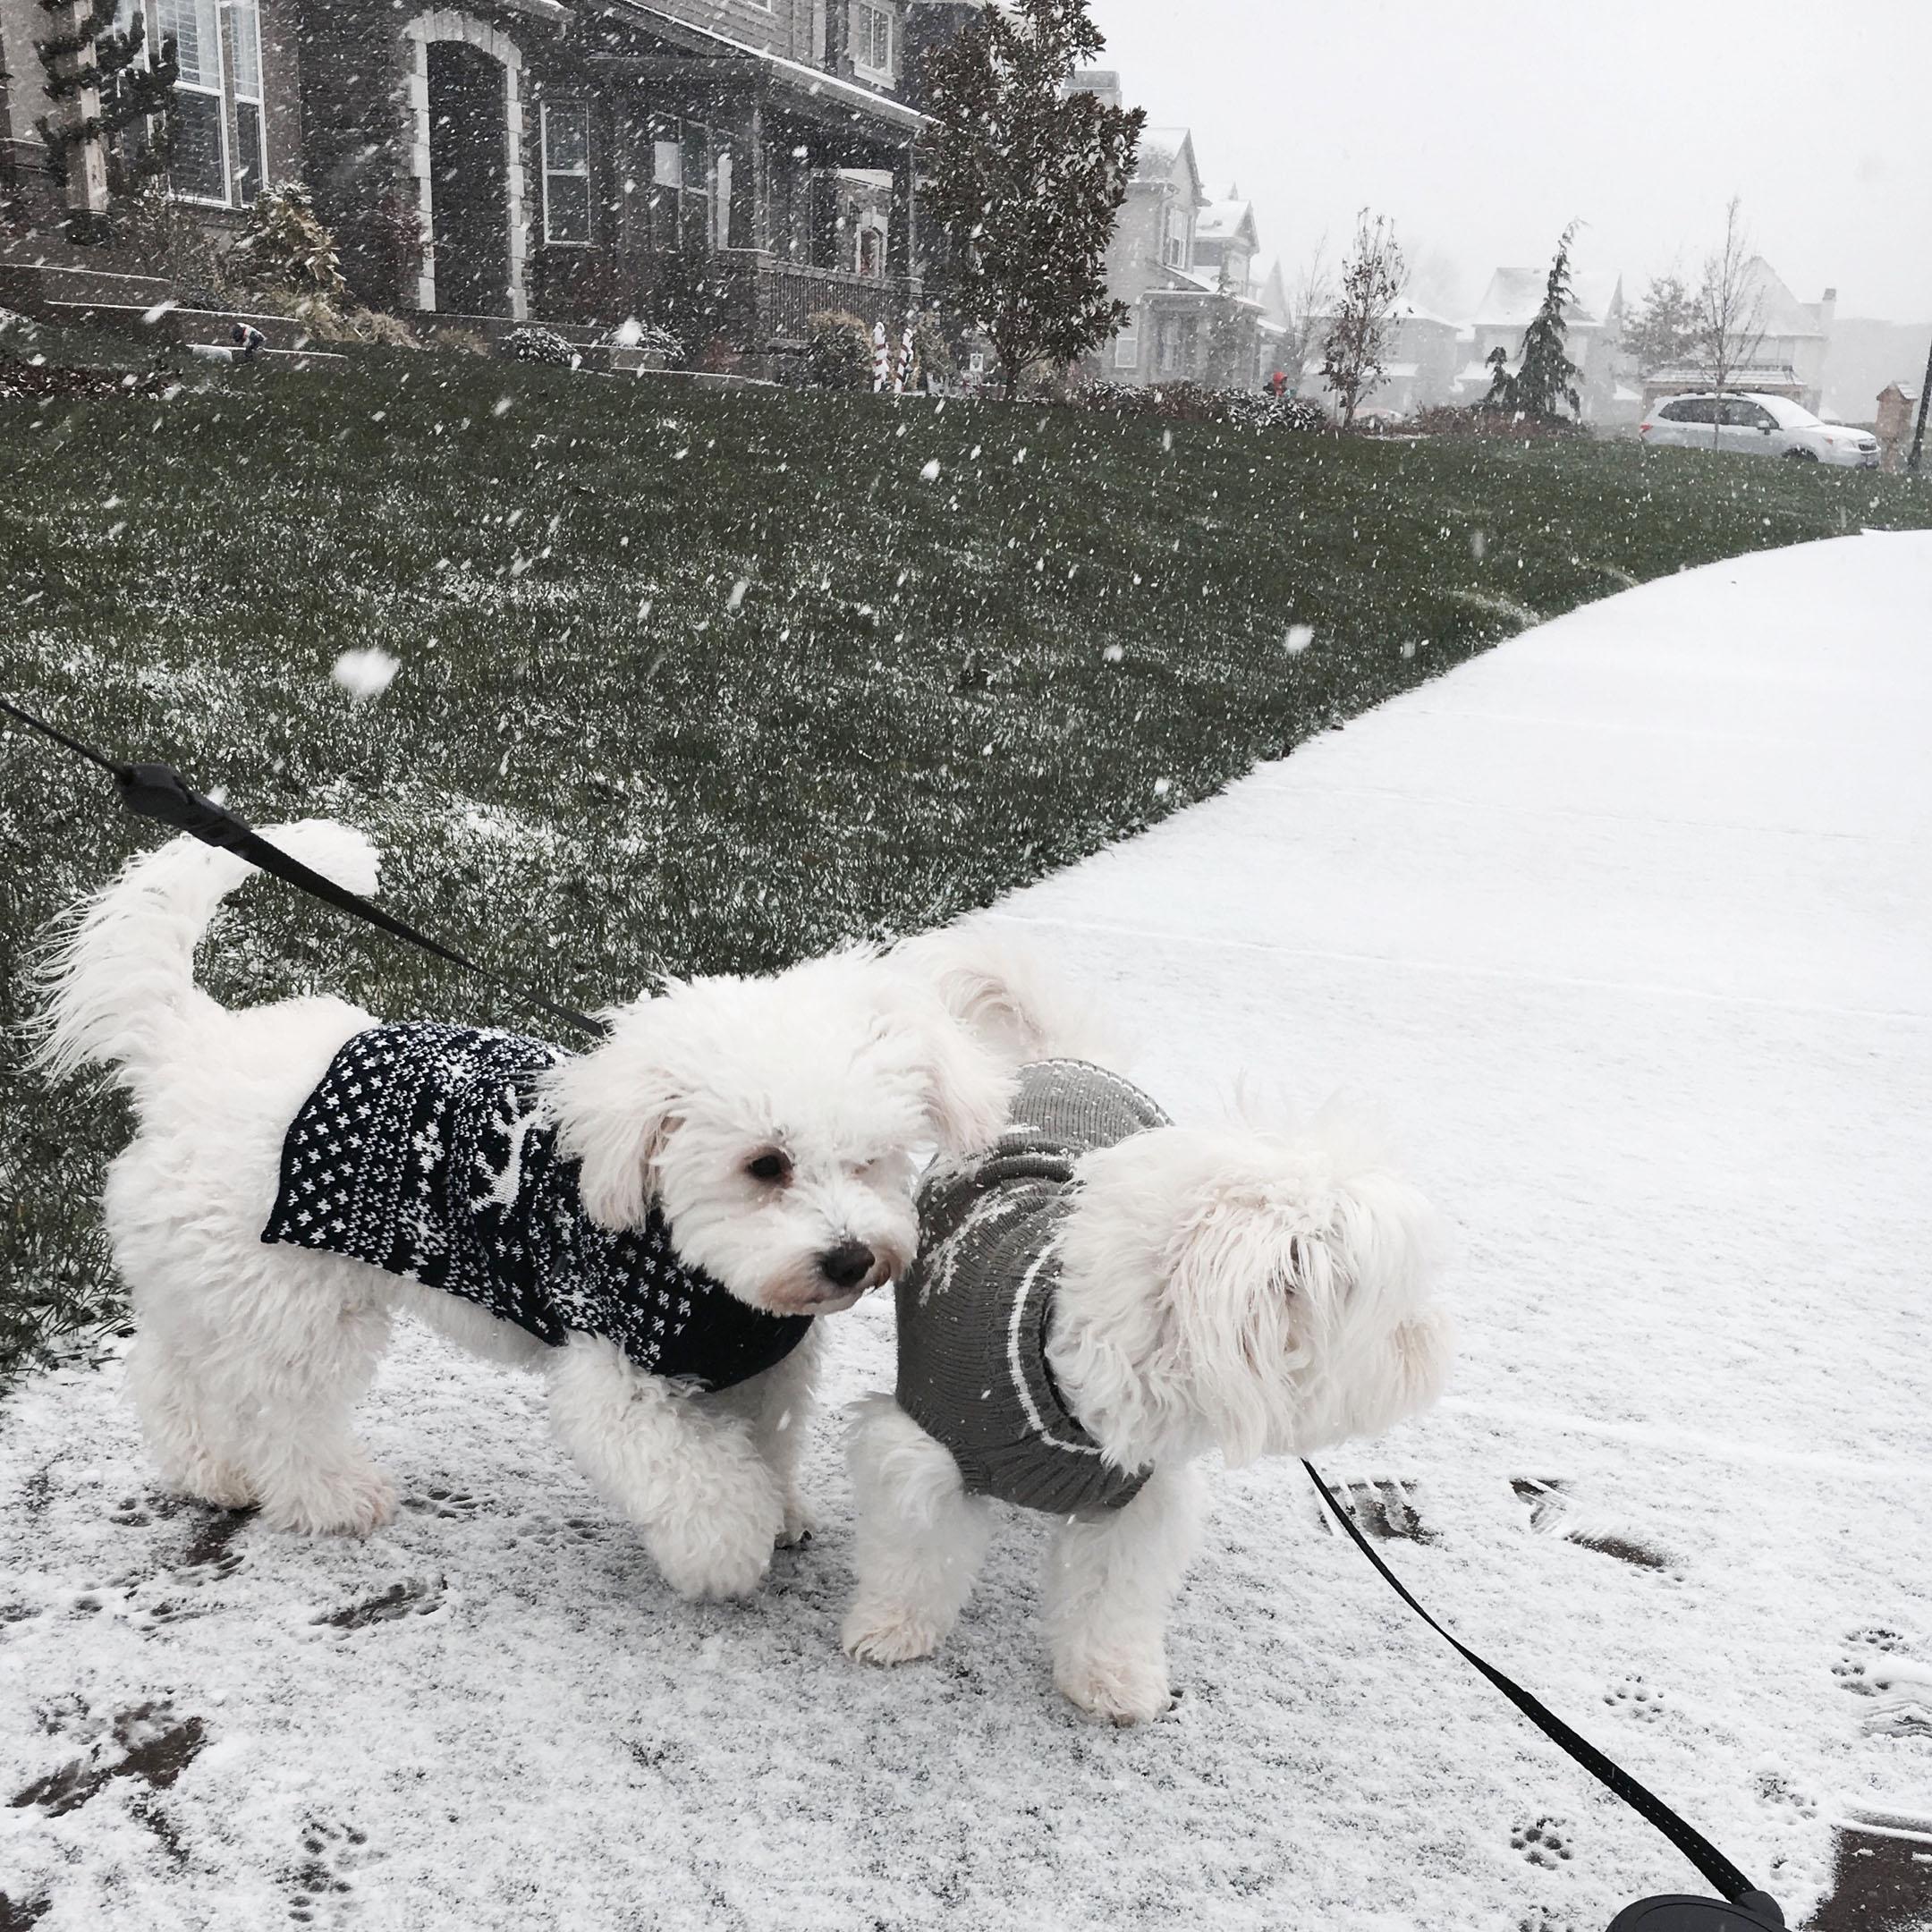 Crystalin Marie's dogs